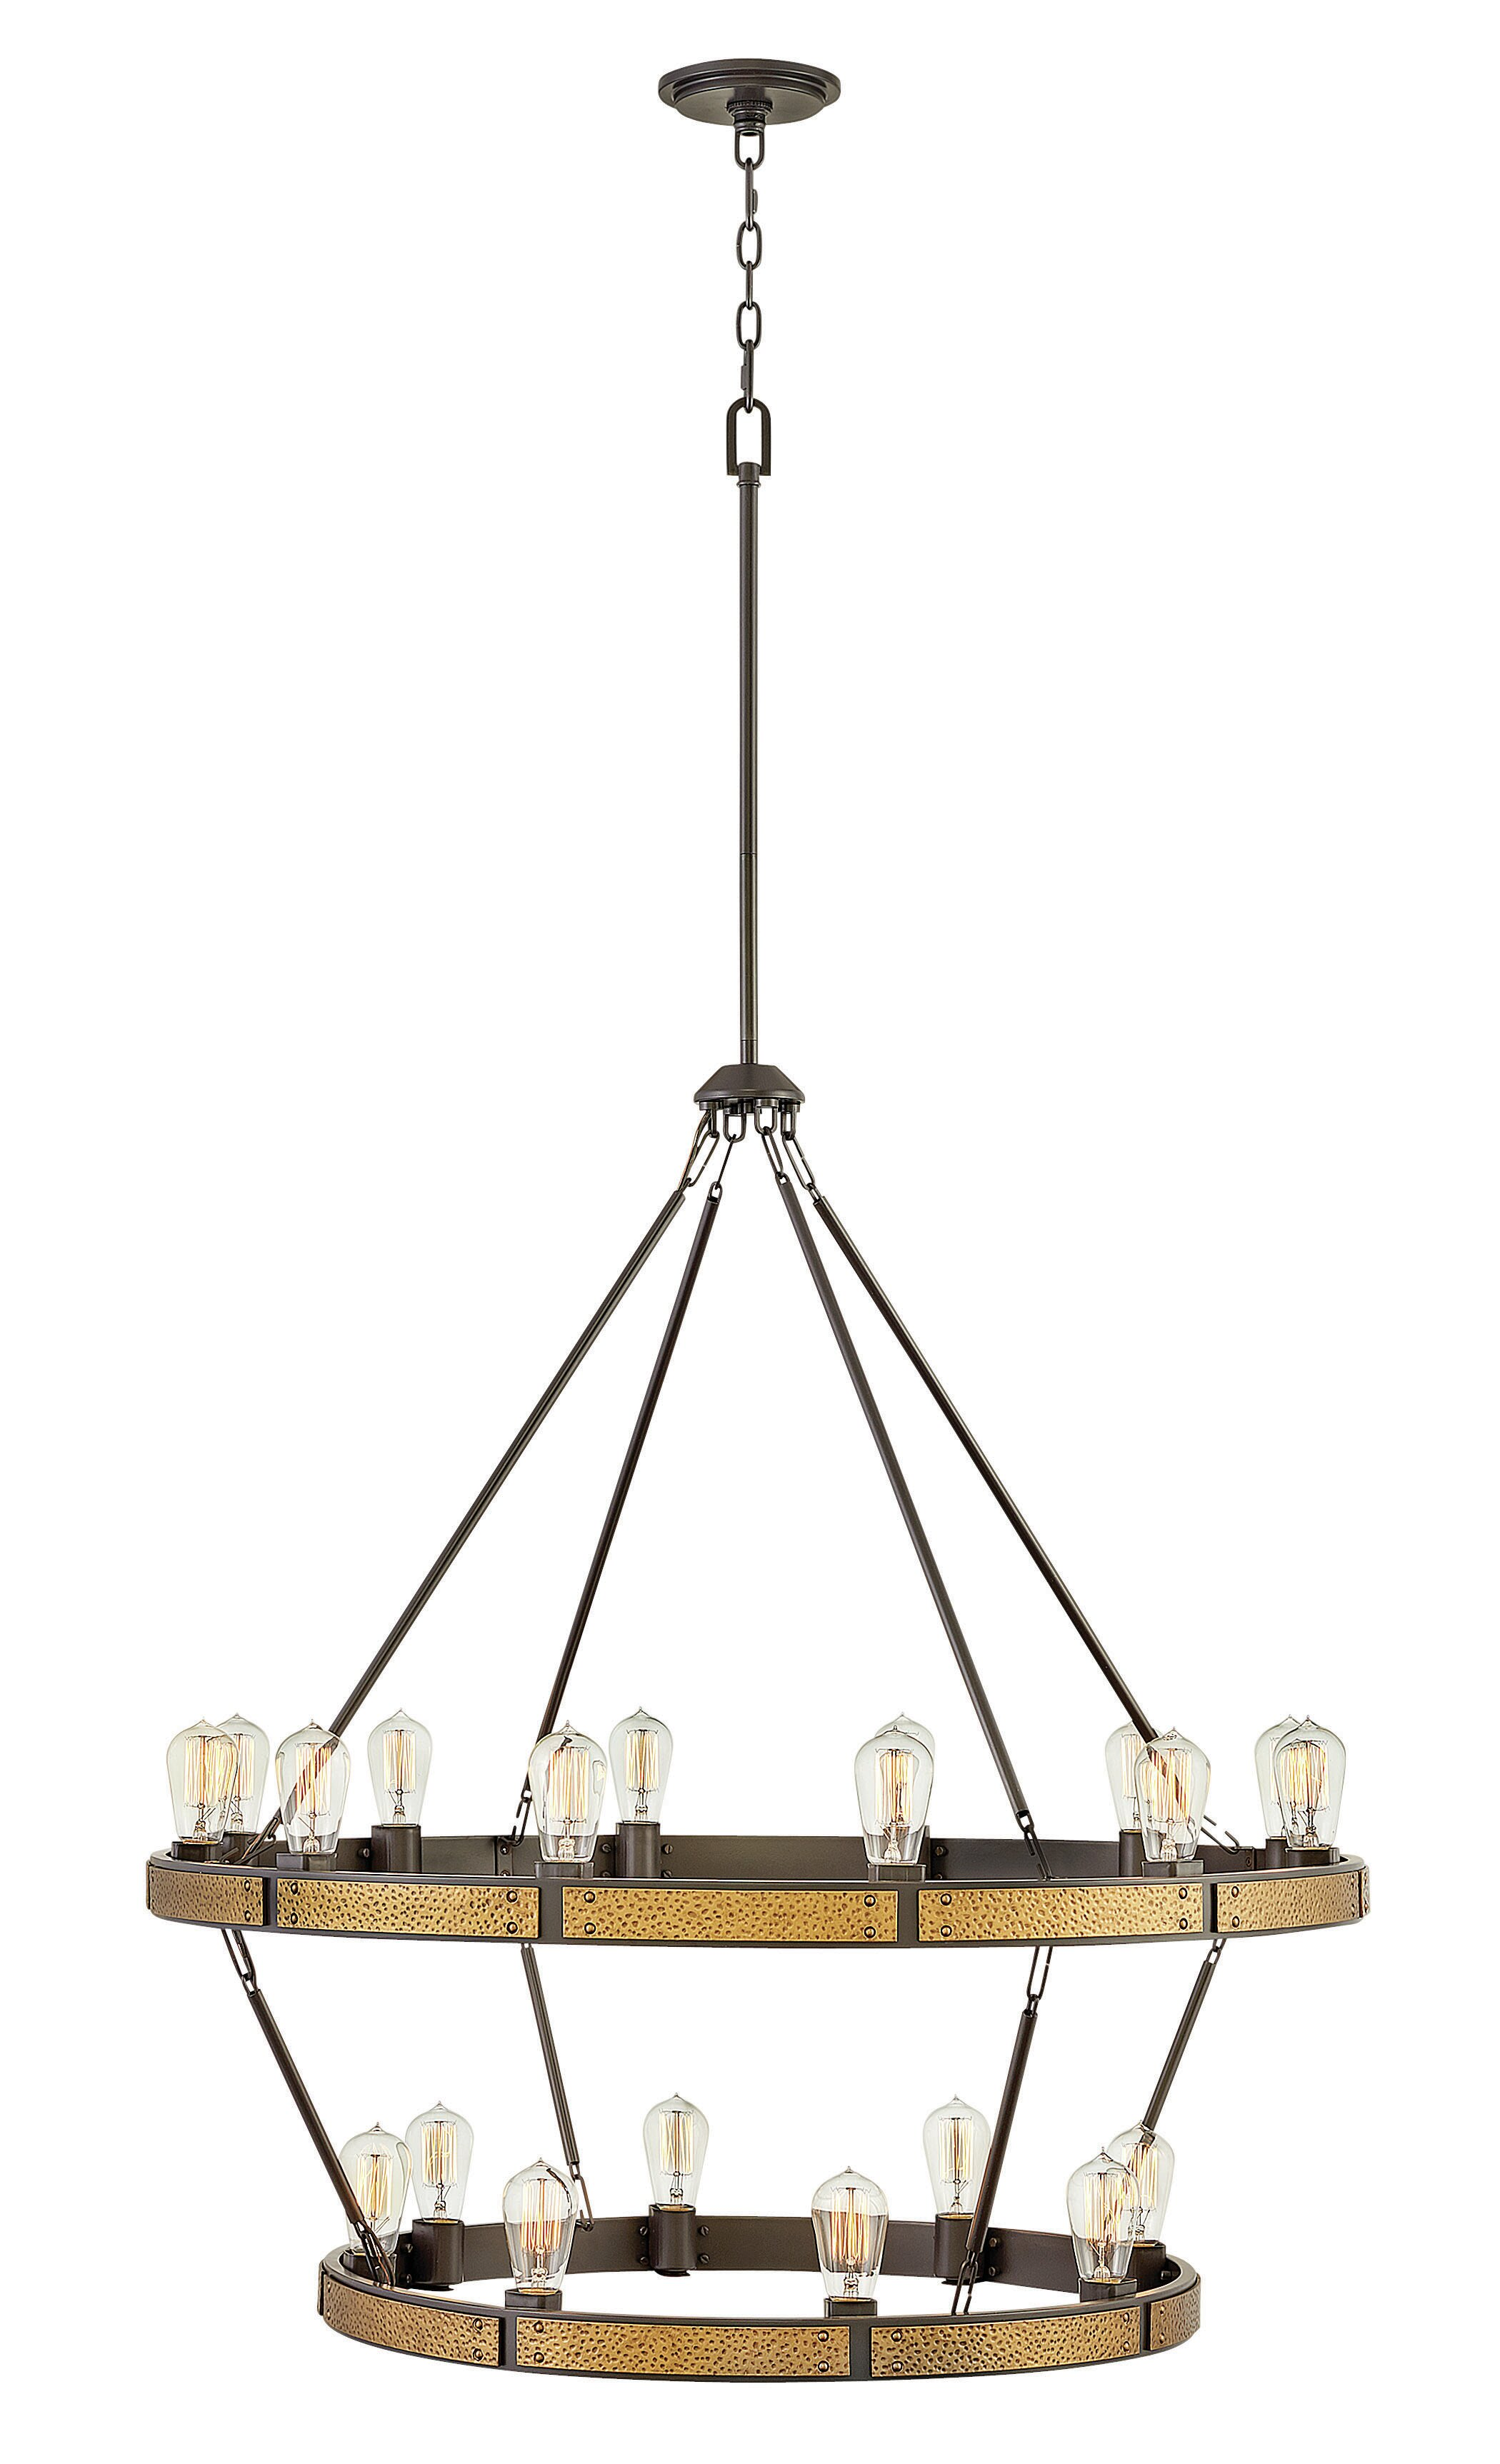 Hinkley lighting everett indoor 20 light lantern chandelier wayfair